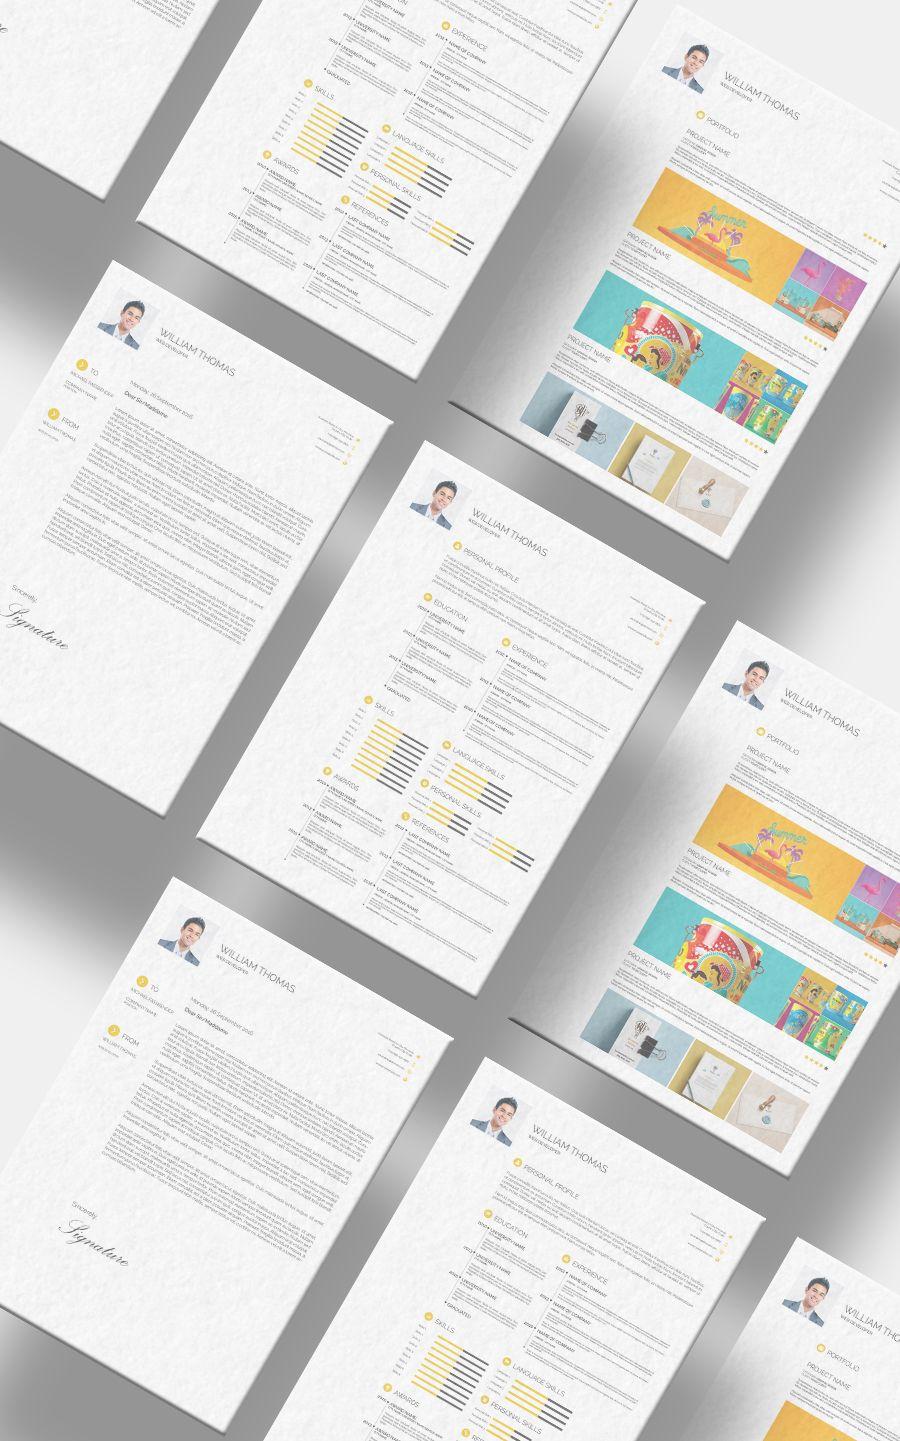 Free CV Resume Set Template Templates, Free design, Resume